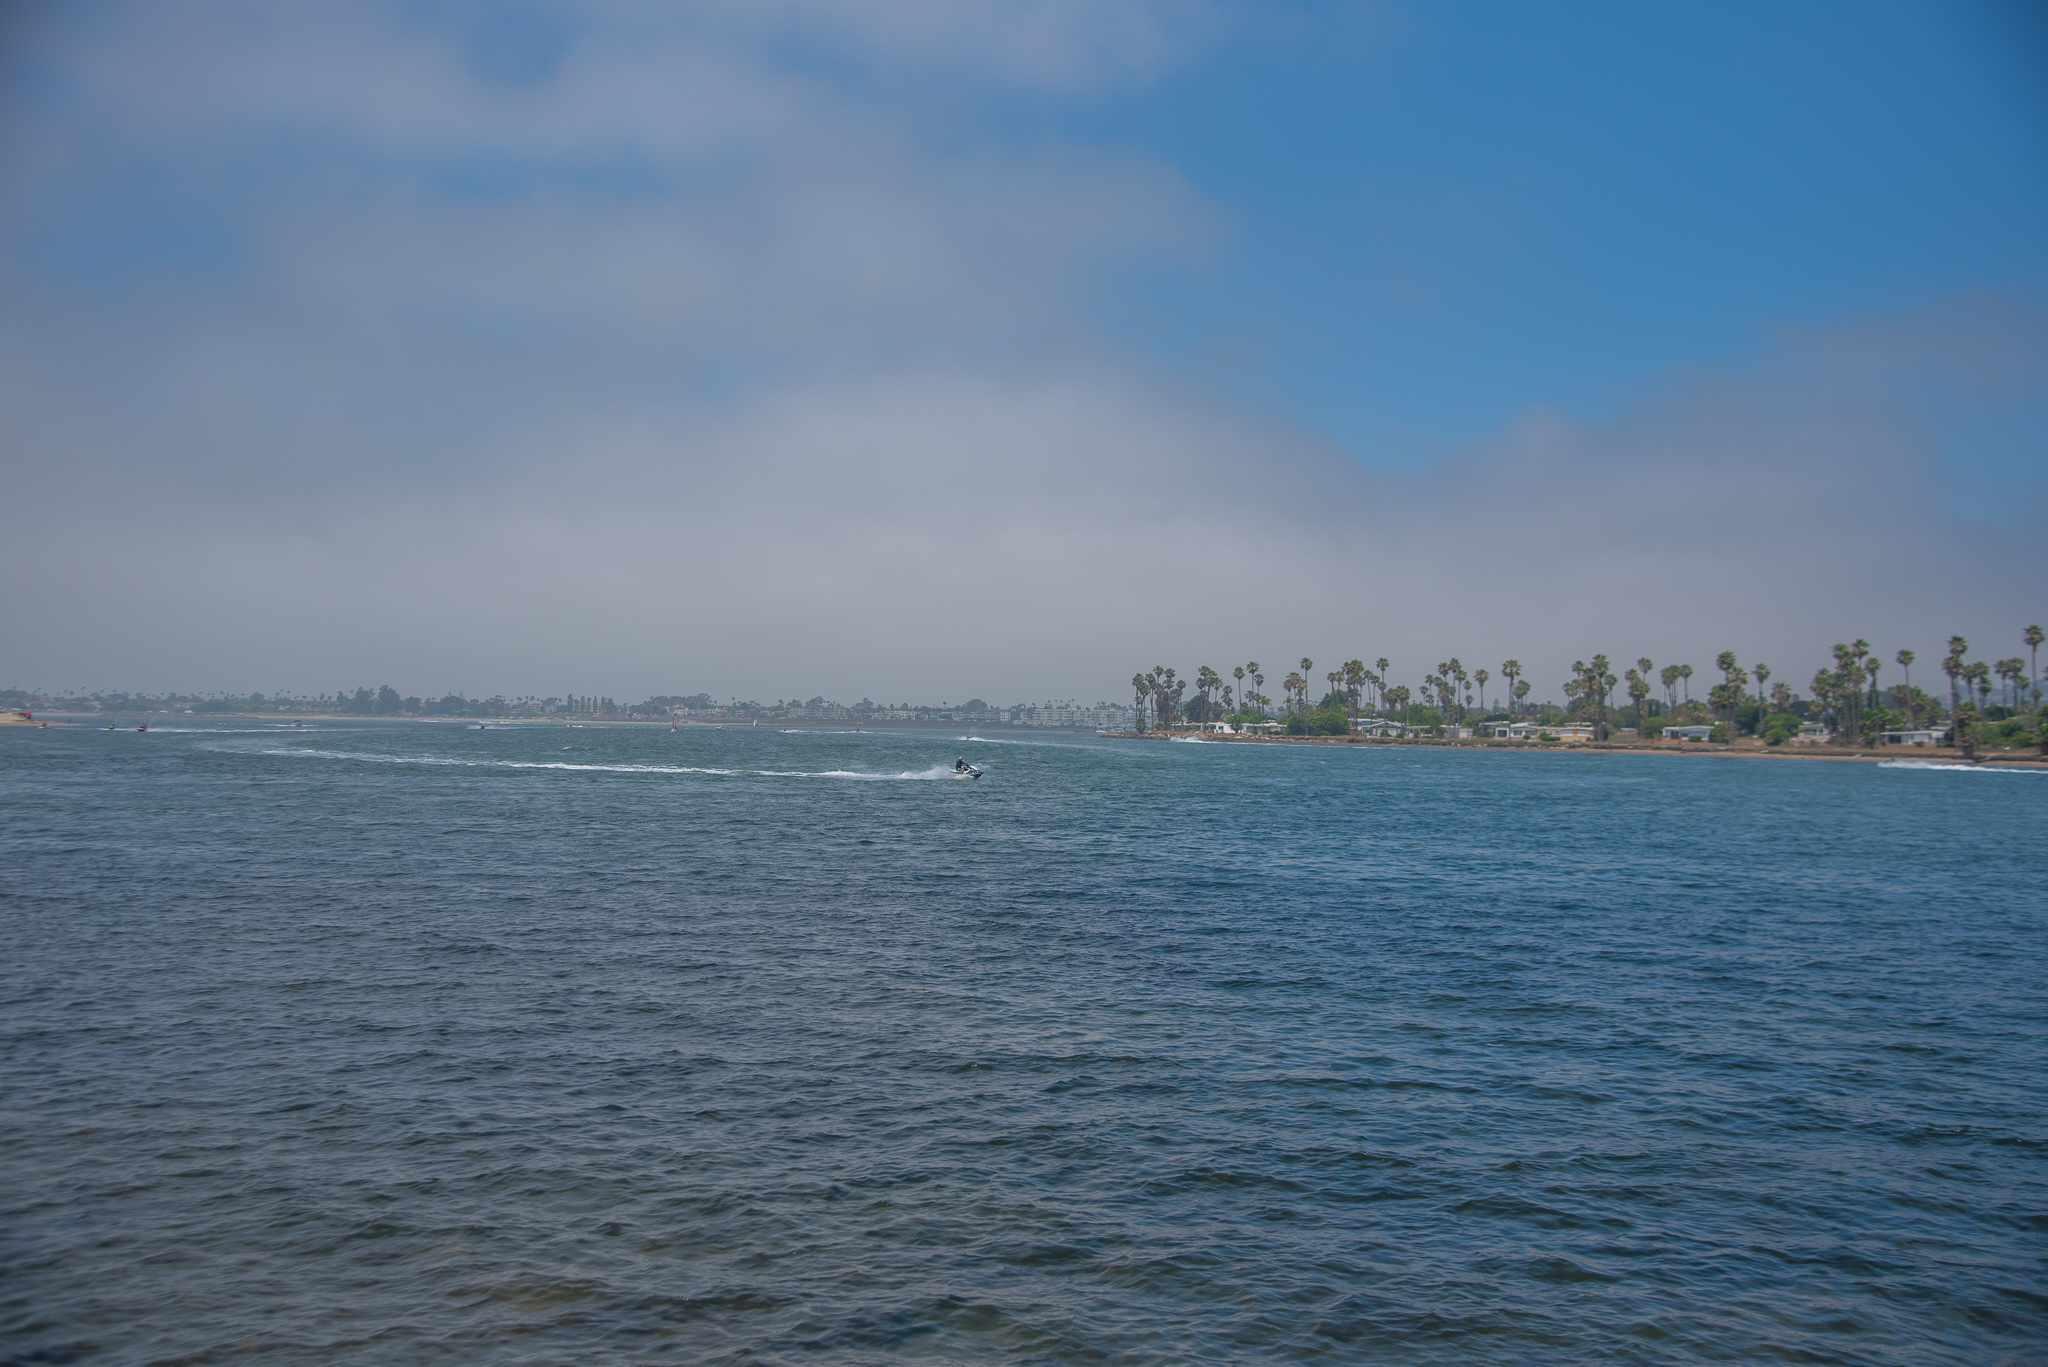 Mission Bay Park in San Diego